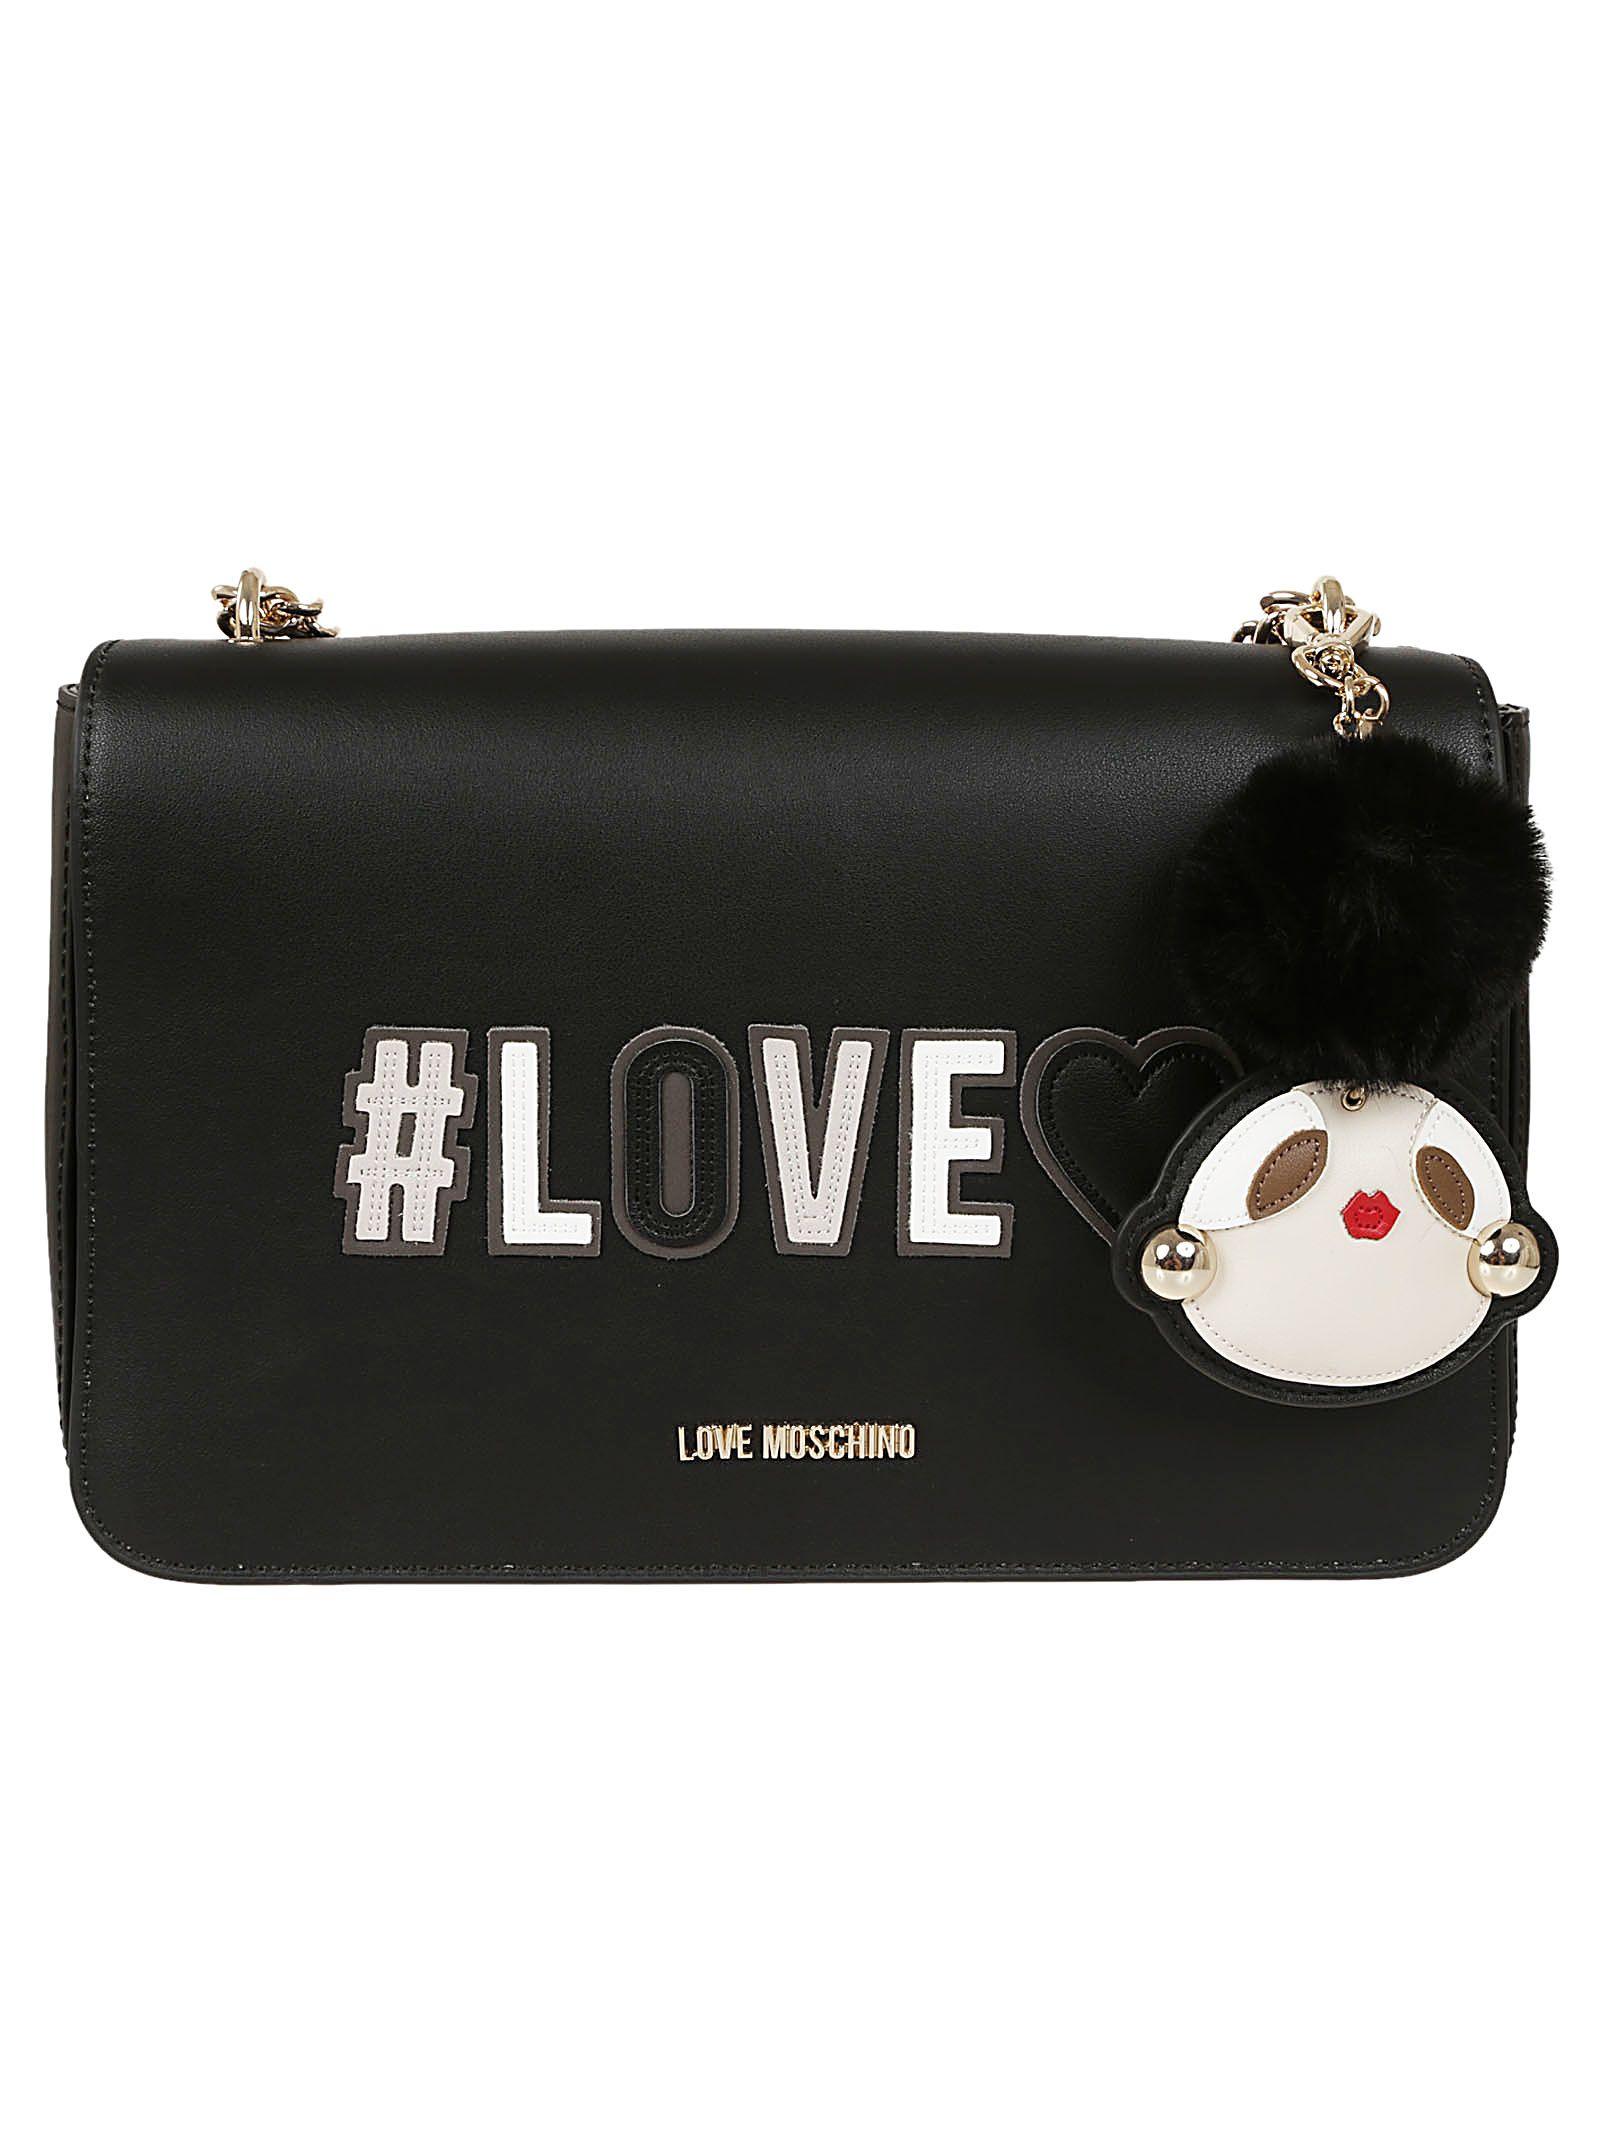 Love Moschino Charm Bag